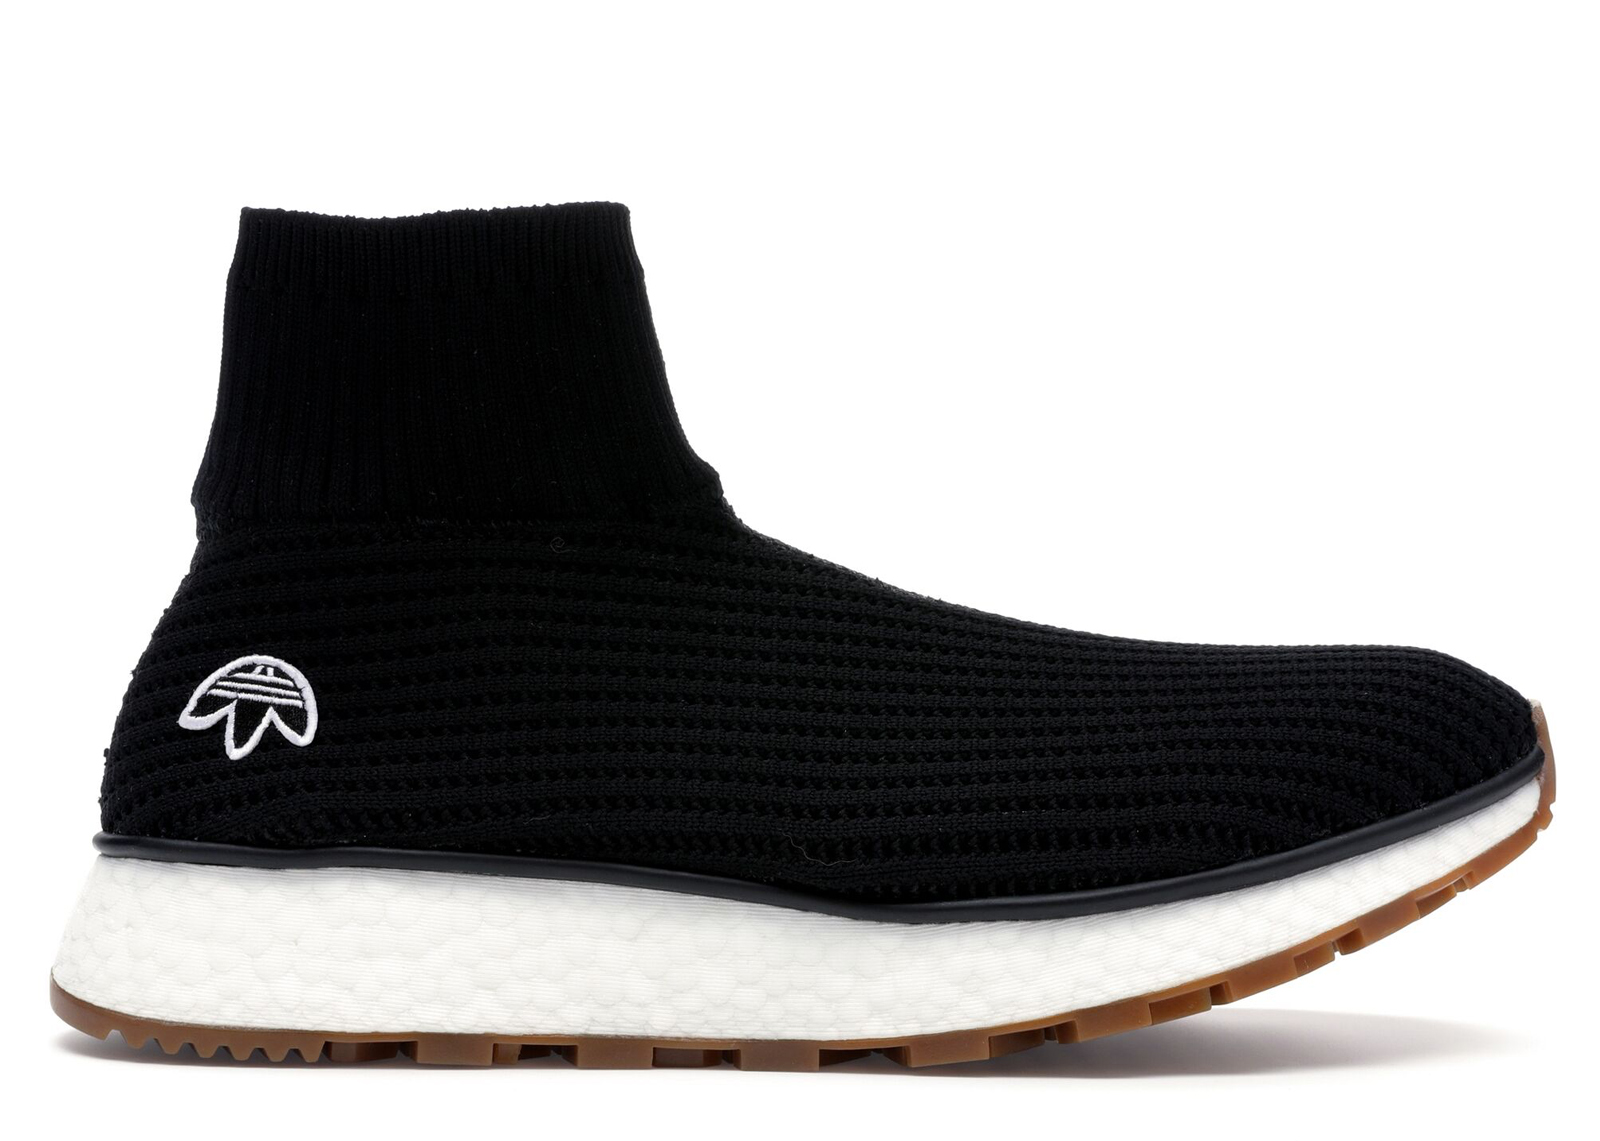 adidas Originals x Alexander Wang Run Clean Trainers Core BlackCore BlackCore Black